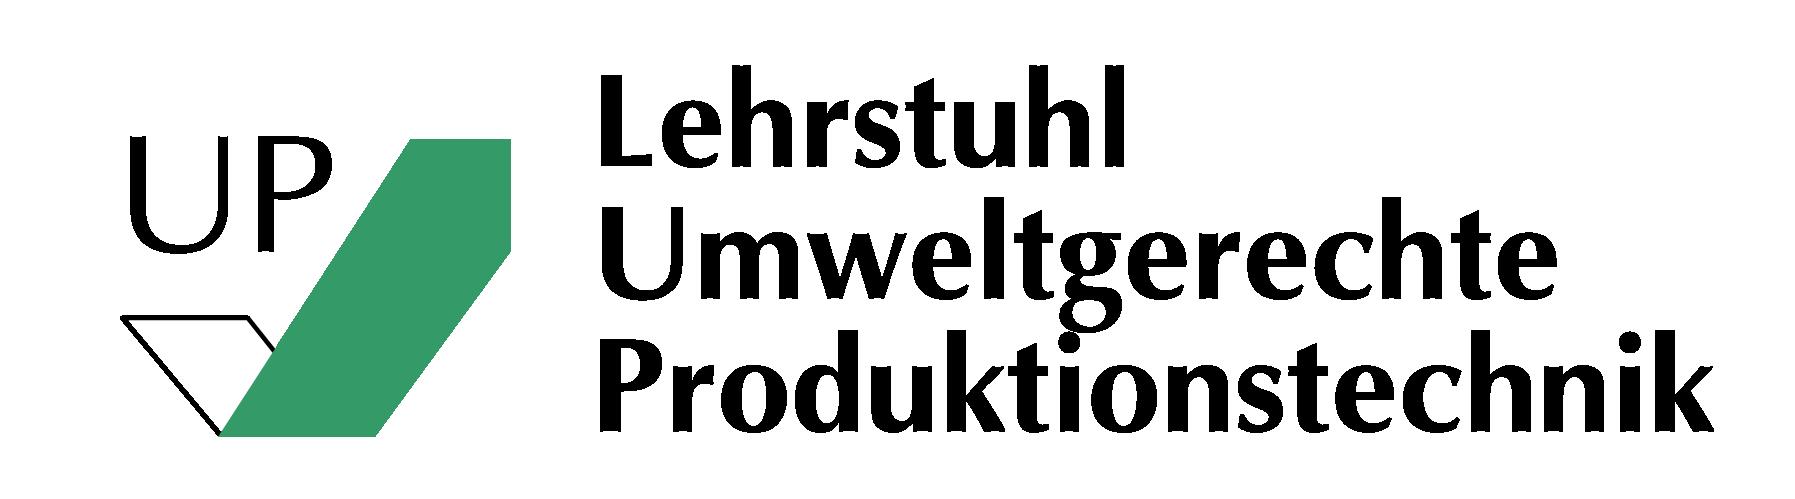 Logo des Lehrstuhls Umweltgerechte Produktionstechnik